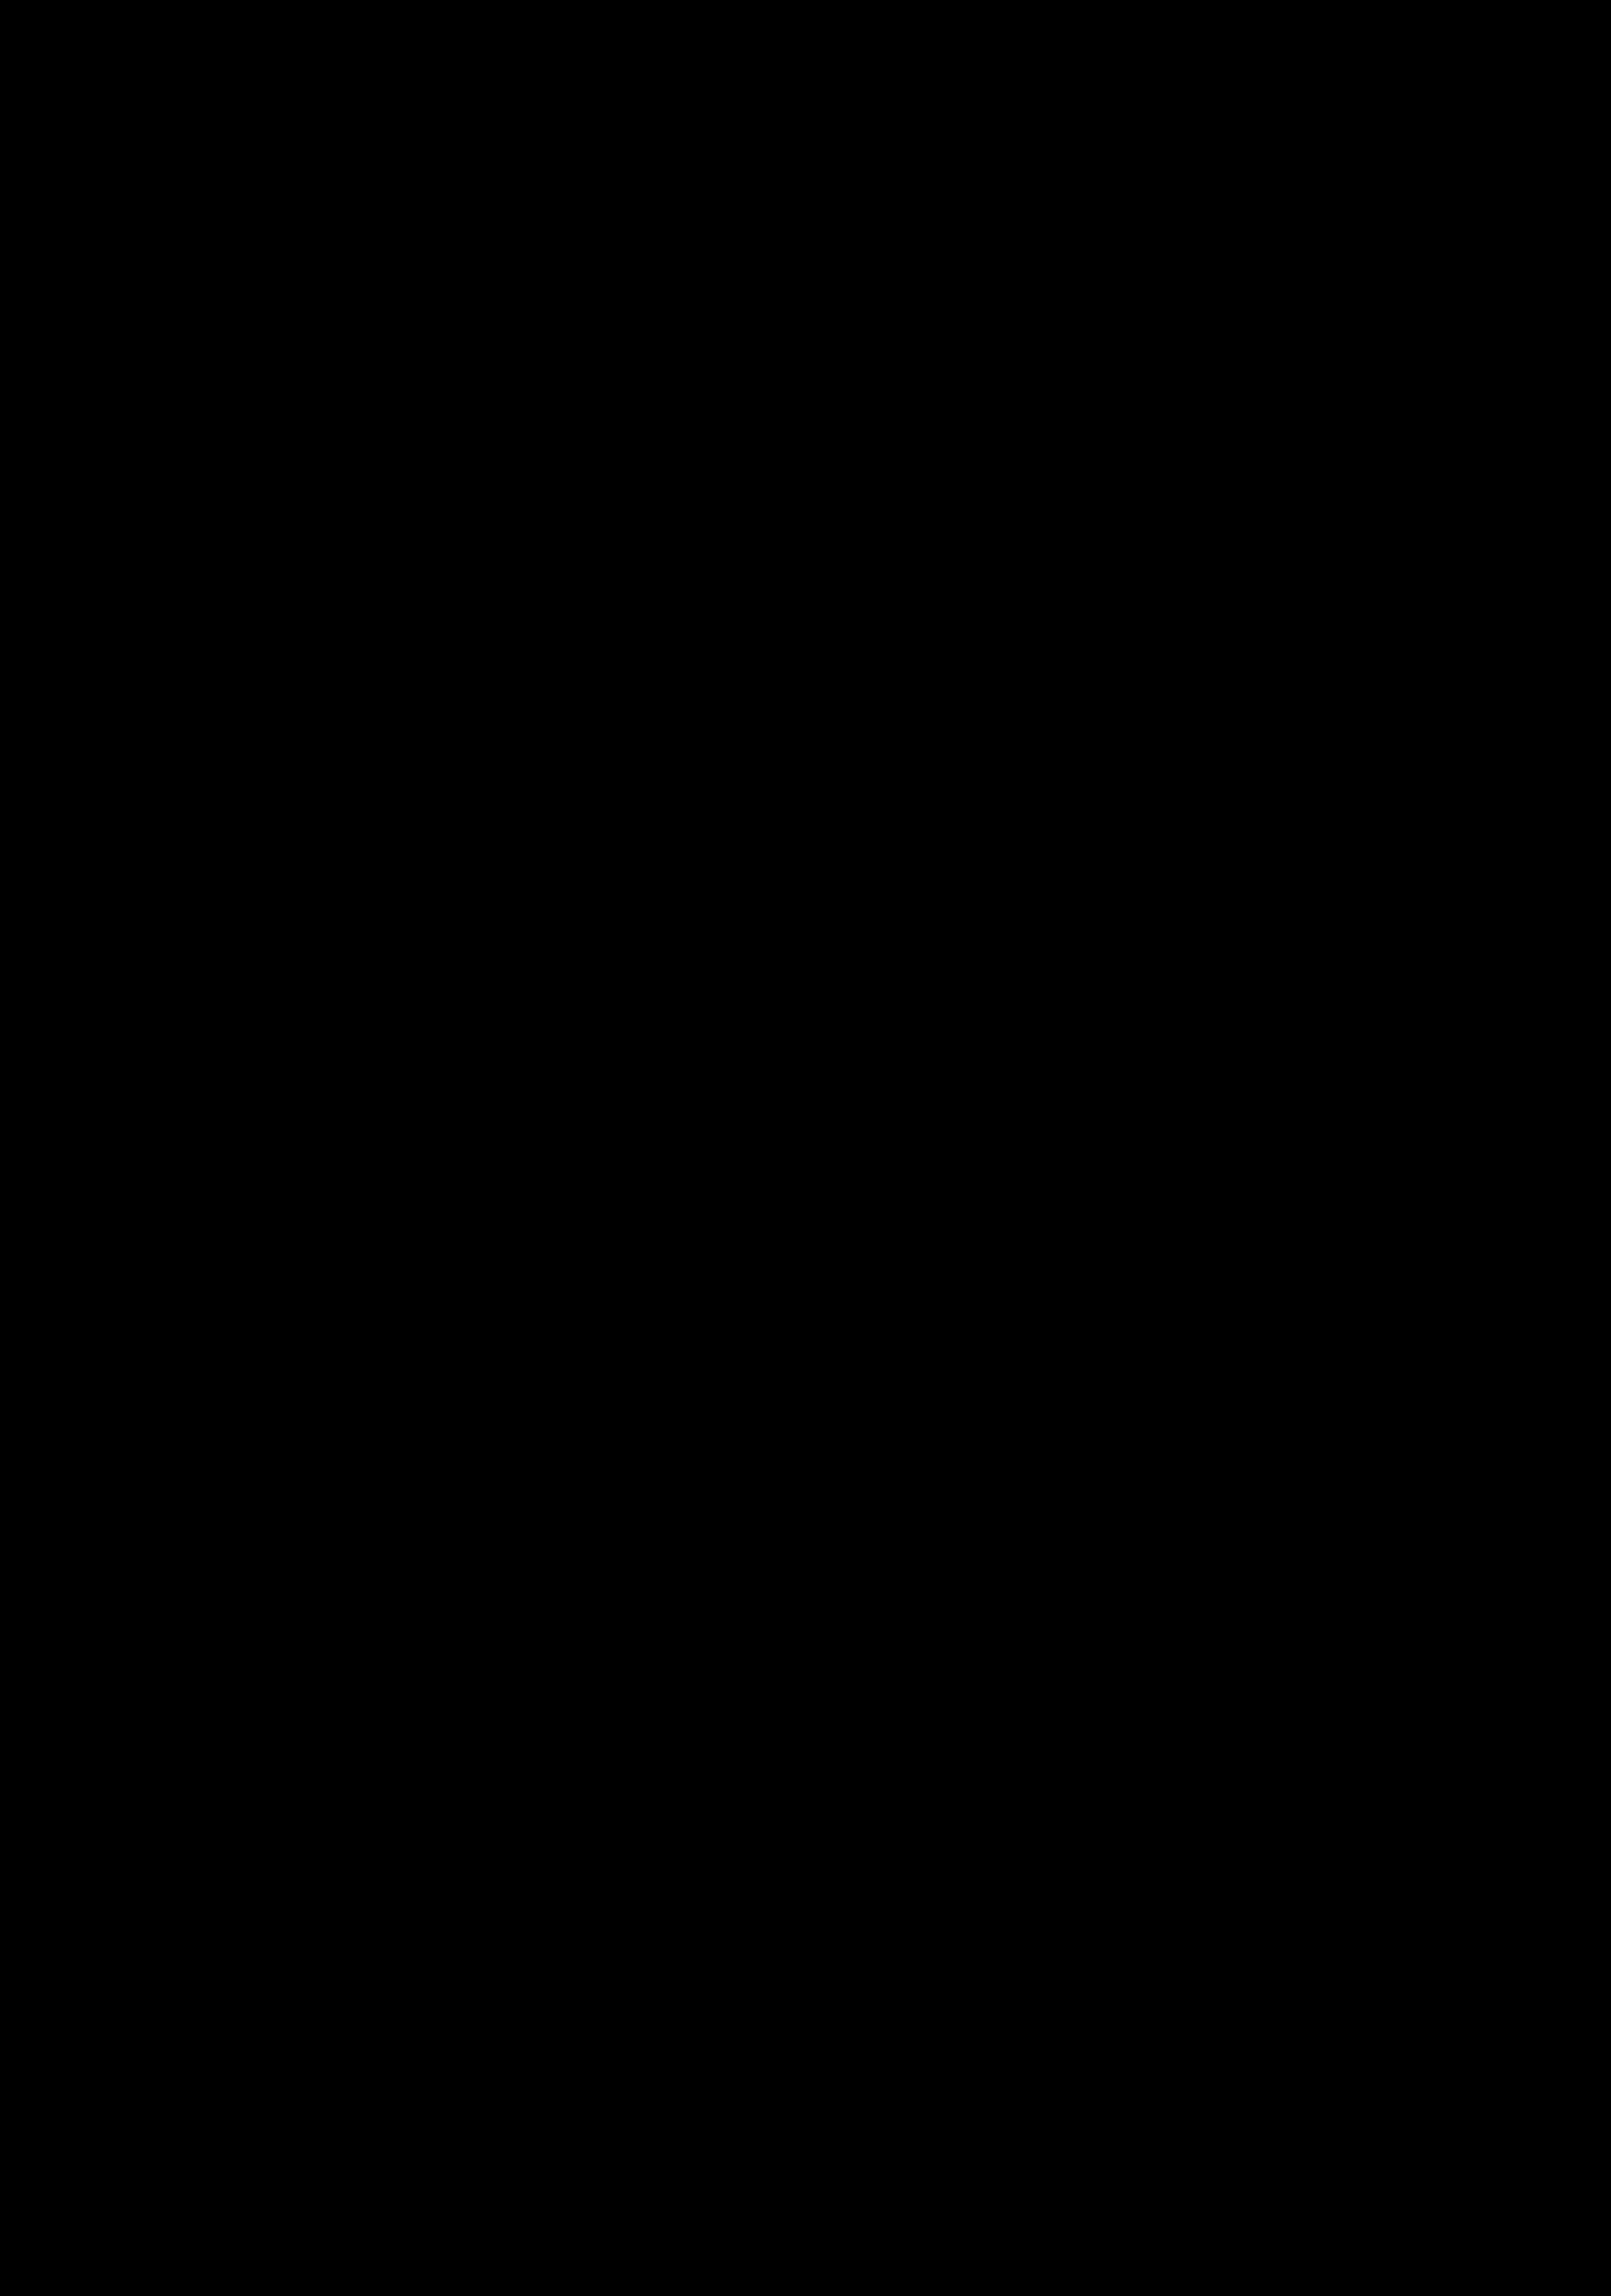 banner black and white stock scorpion transparent cartoon #102721030